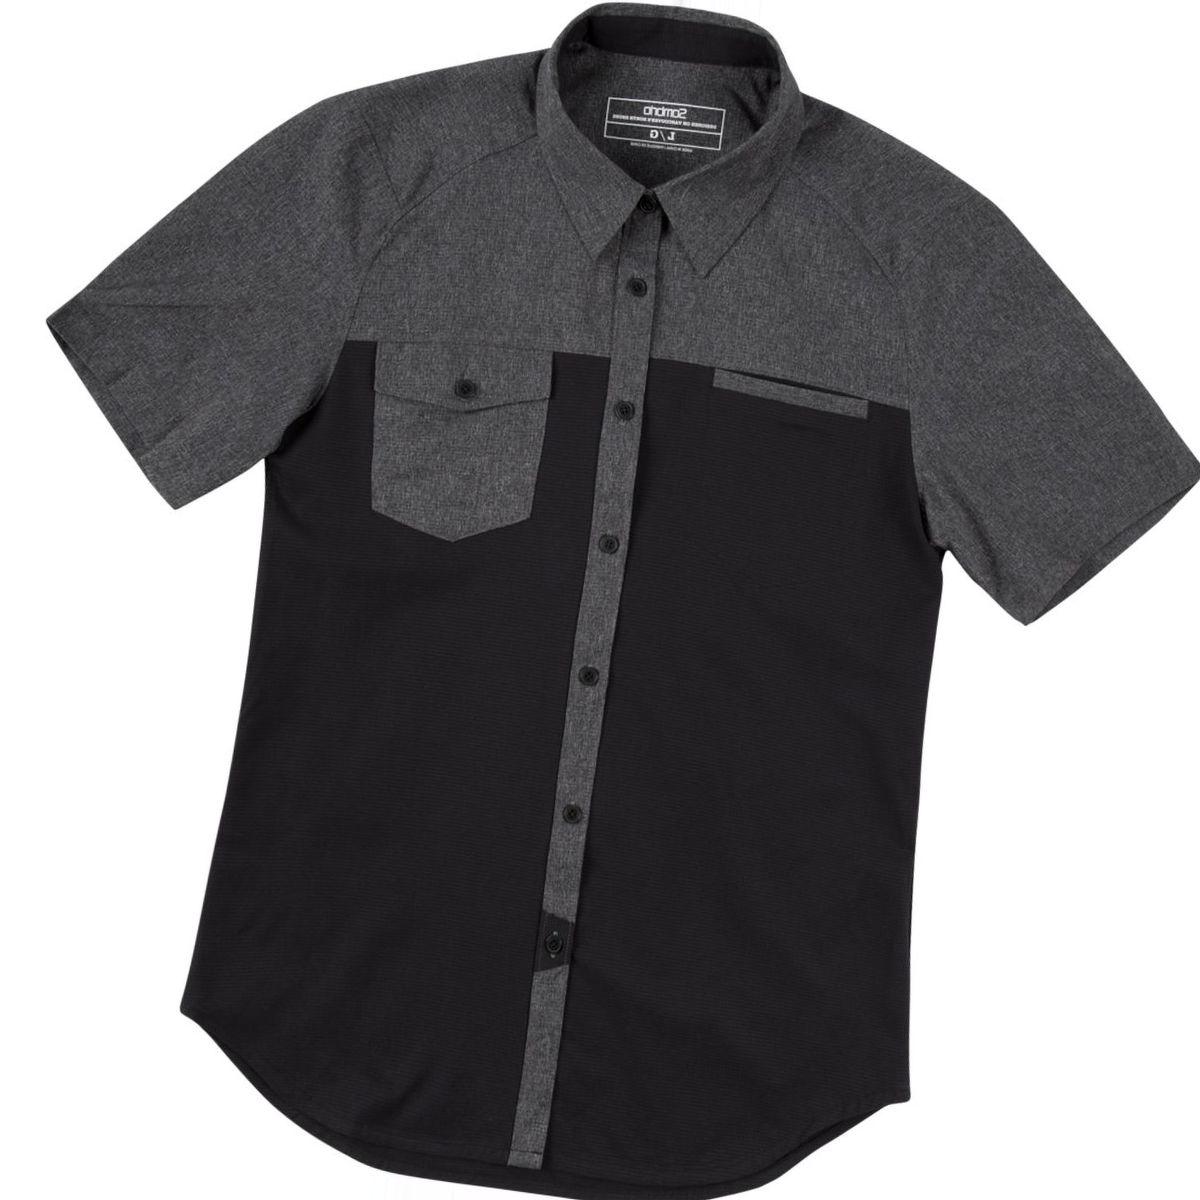 Sombrio Shore Shirt - Short-Sleeve - Men's